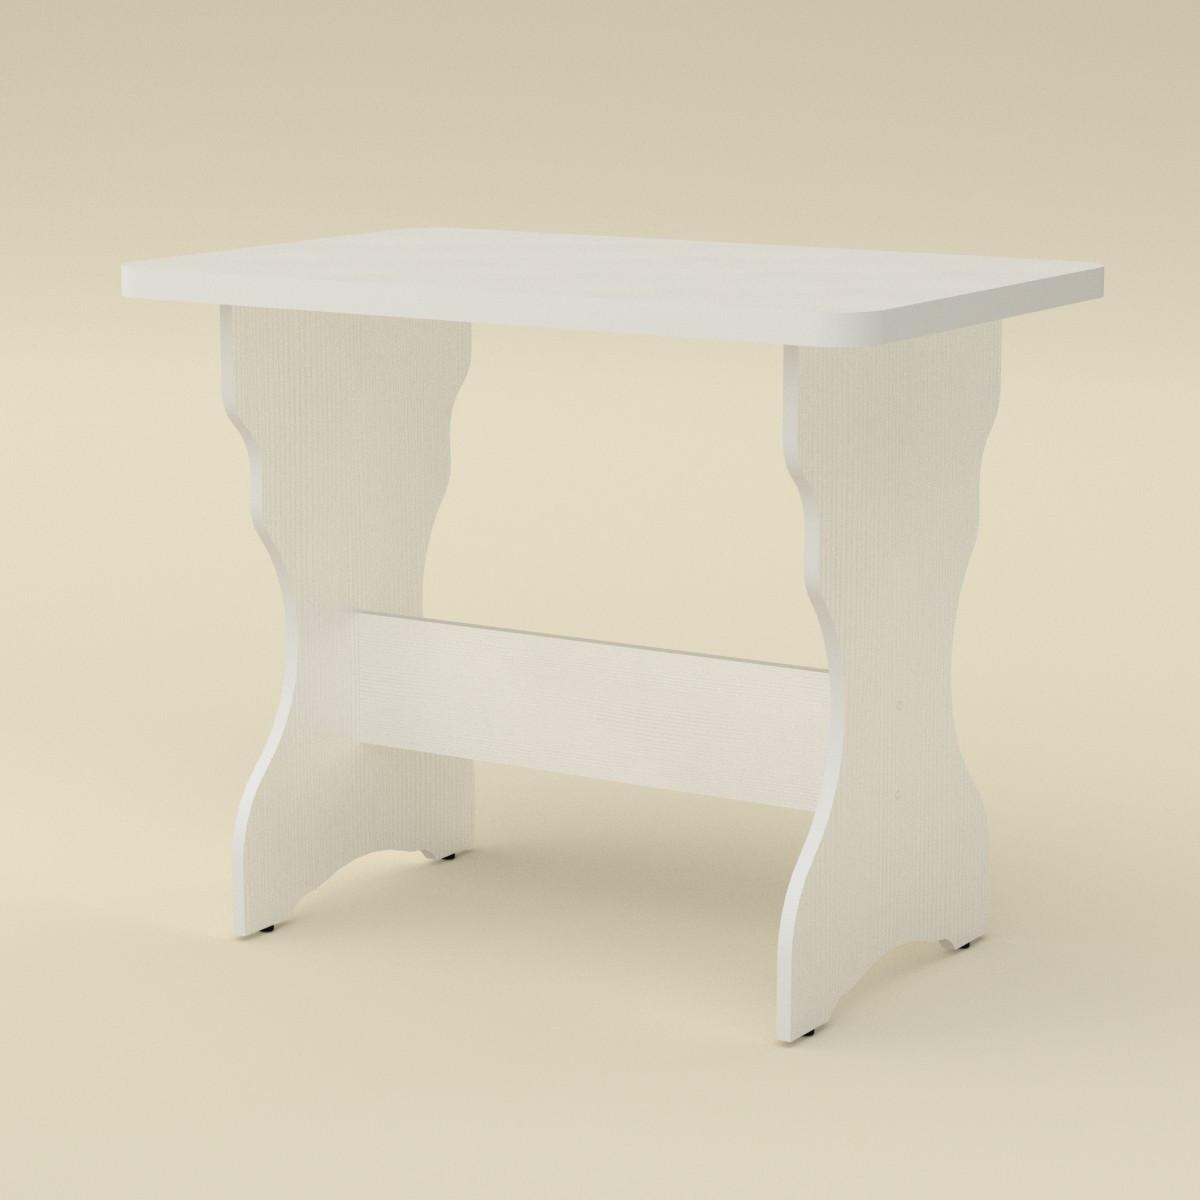 Стол кухонный КС-2 нимфея альба (белый) Компанит (90х60х71 см)